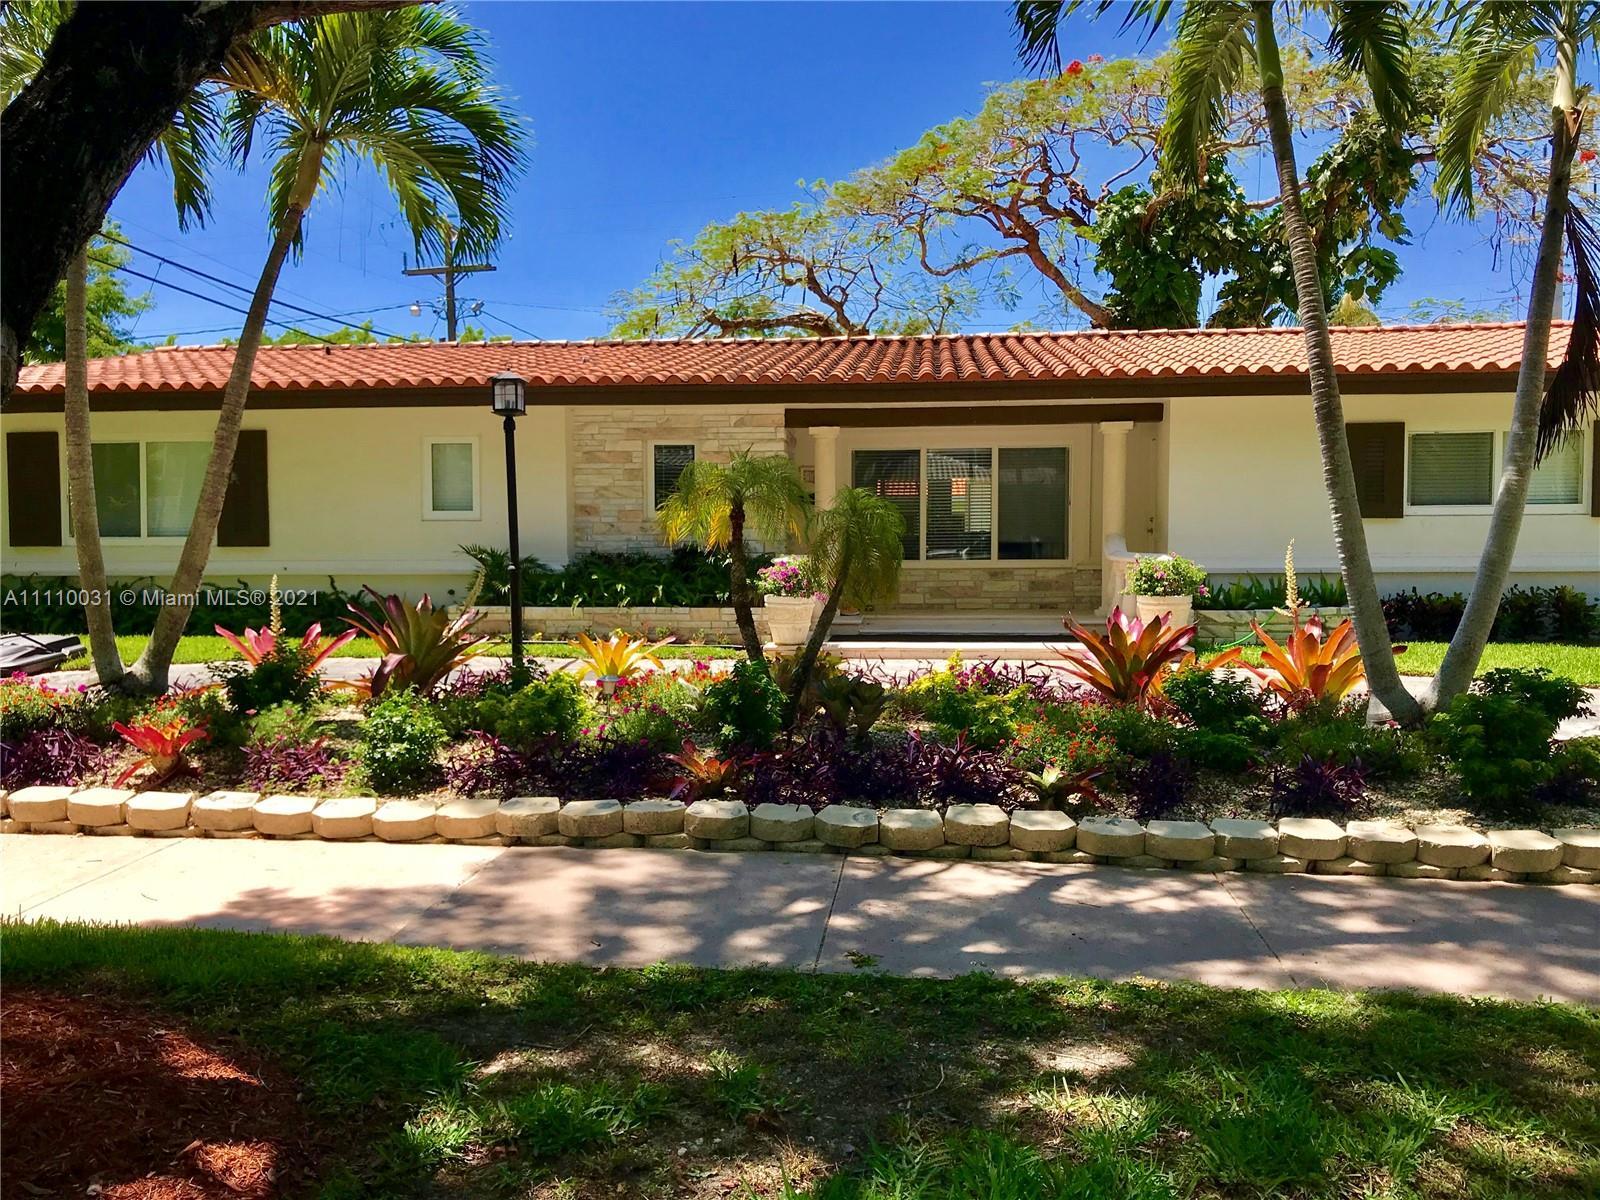 Riviera #1542 - 1542 Siena Ave #1542, Coral Gables, FL 33146